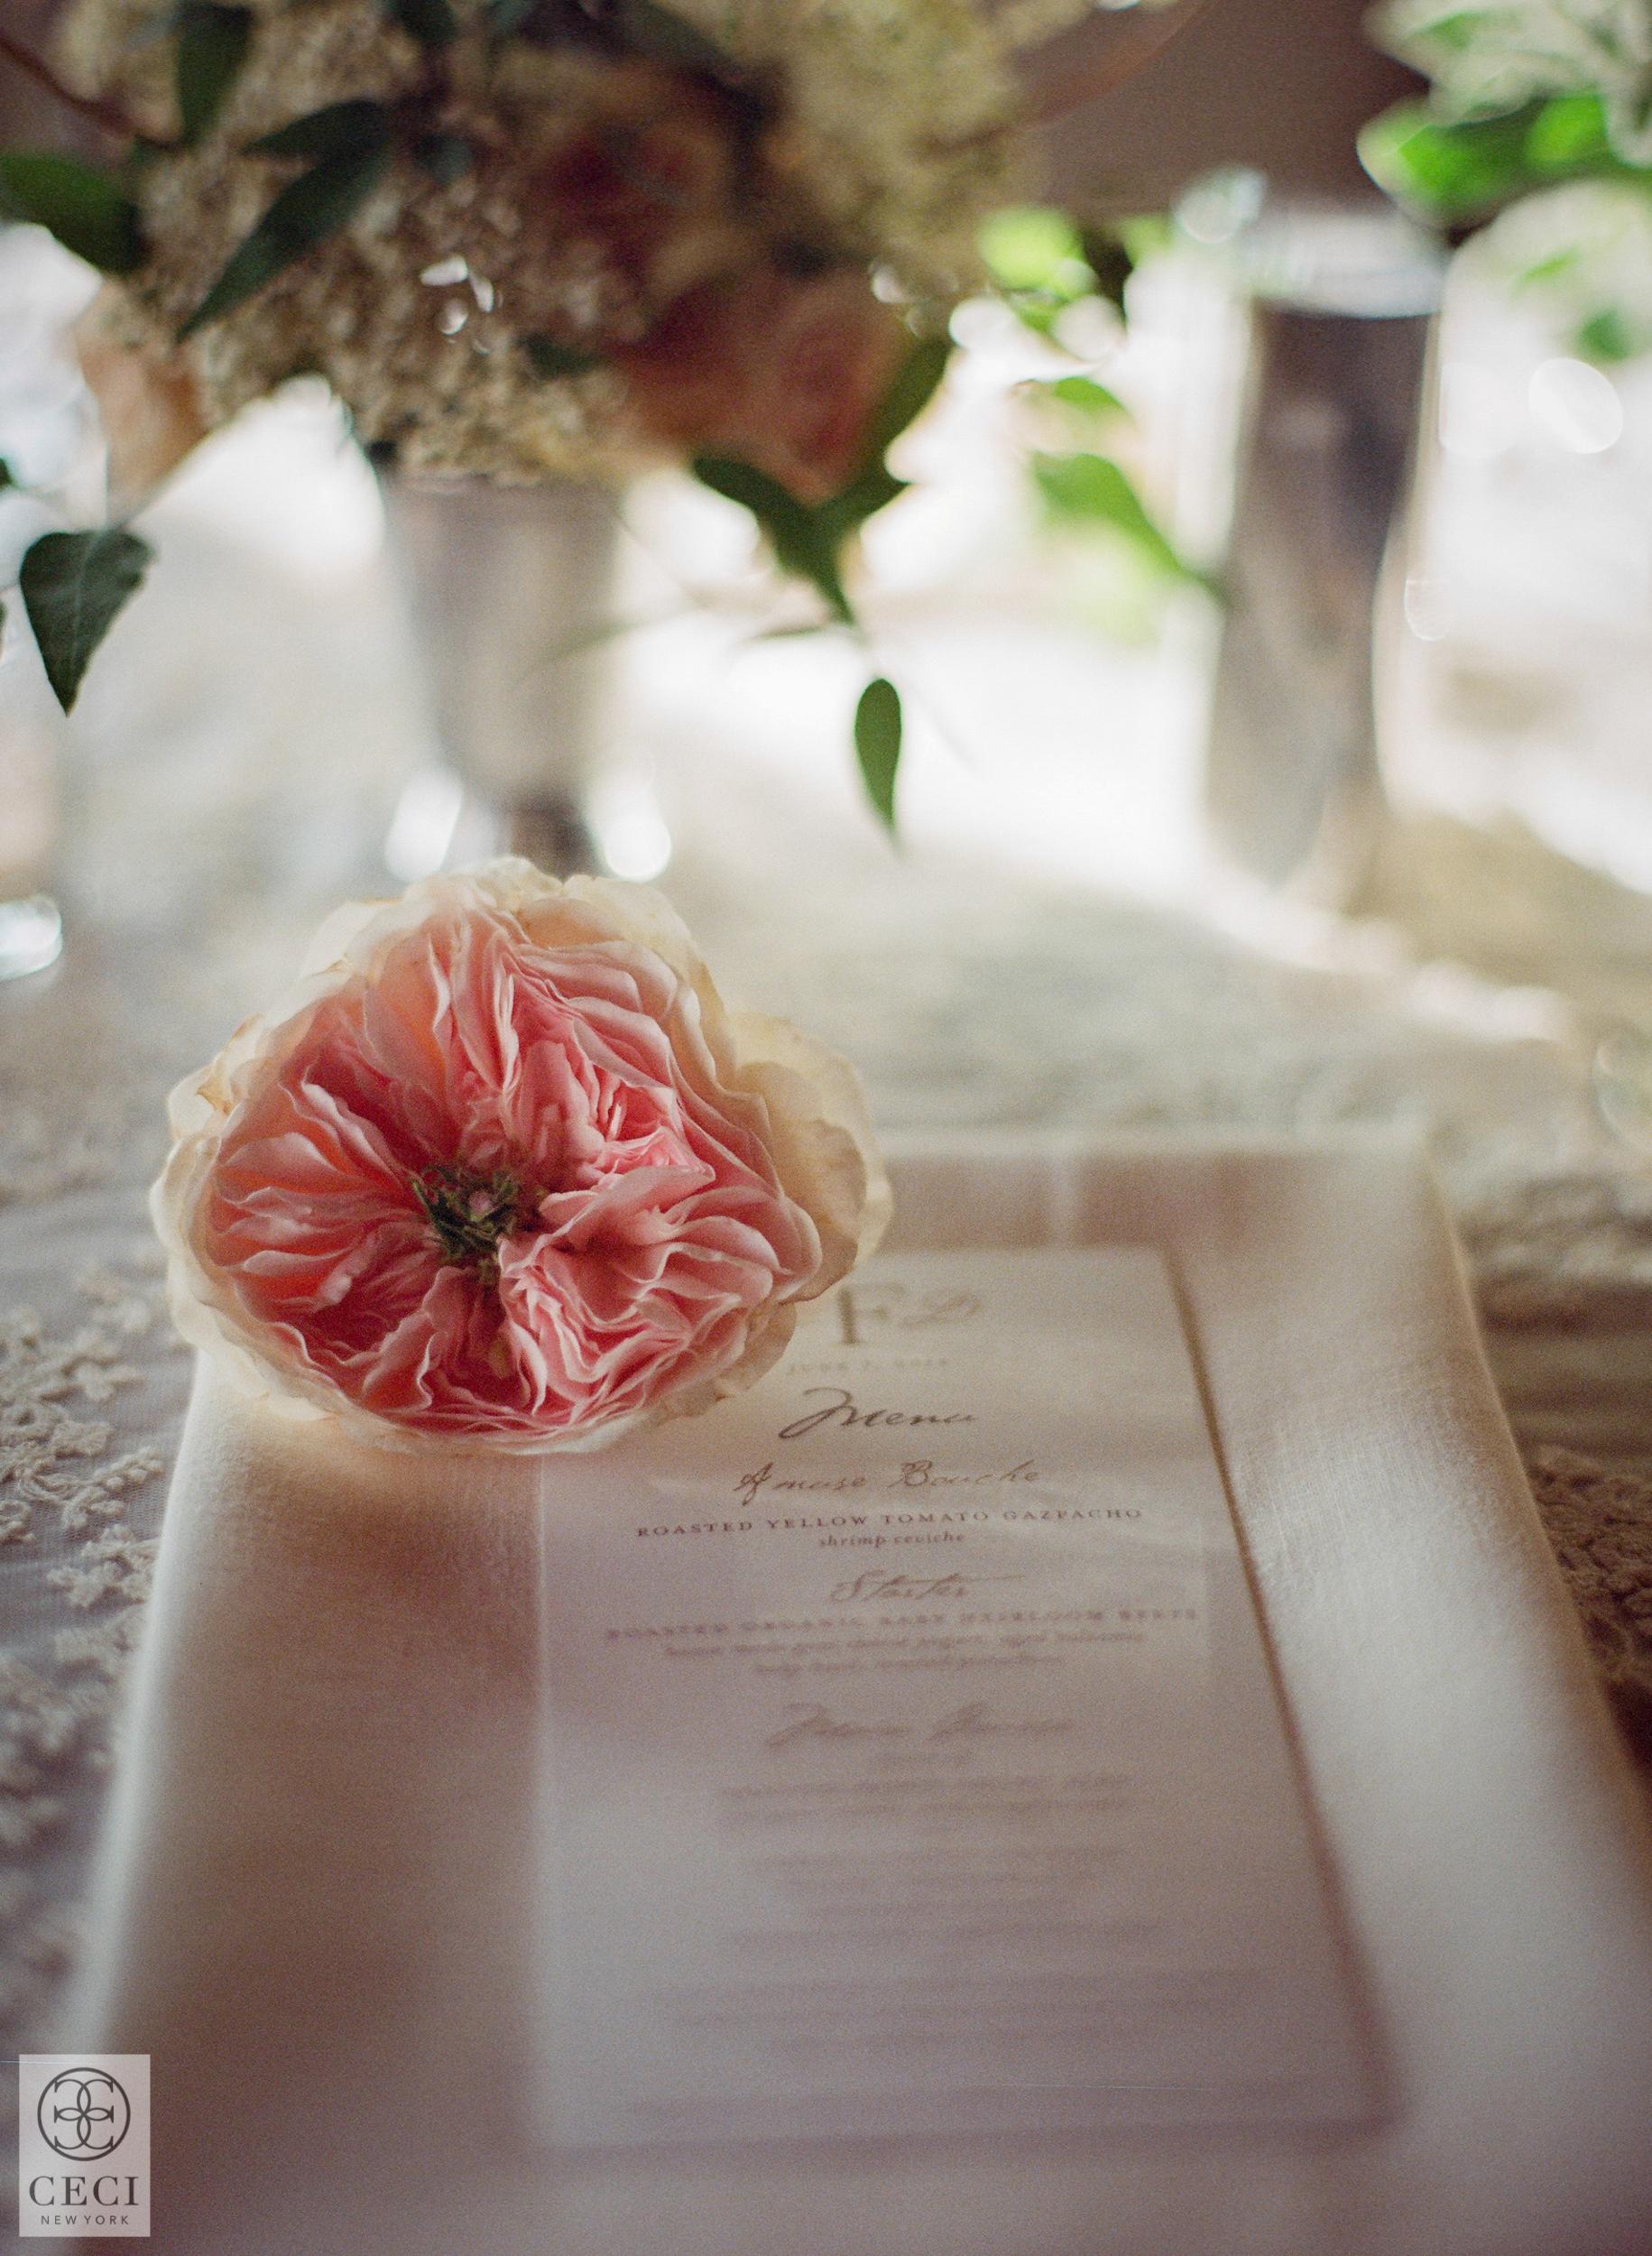 Ceci_New_York_Lyndsey_Hamilton_Events_Invitations_Wedding_Amangani_Elegance_Gold_Foil_Letterpress_Classic_Stamping_Custom_Couture_Personalized-12.jpg